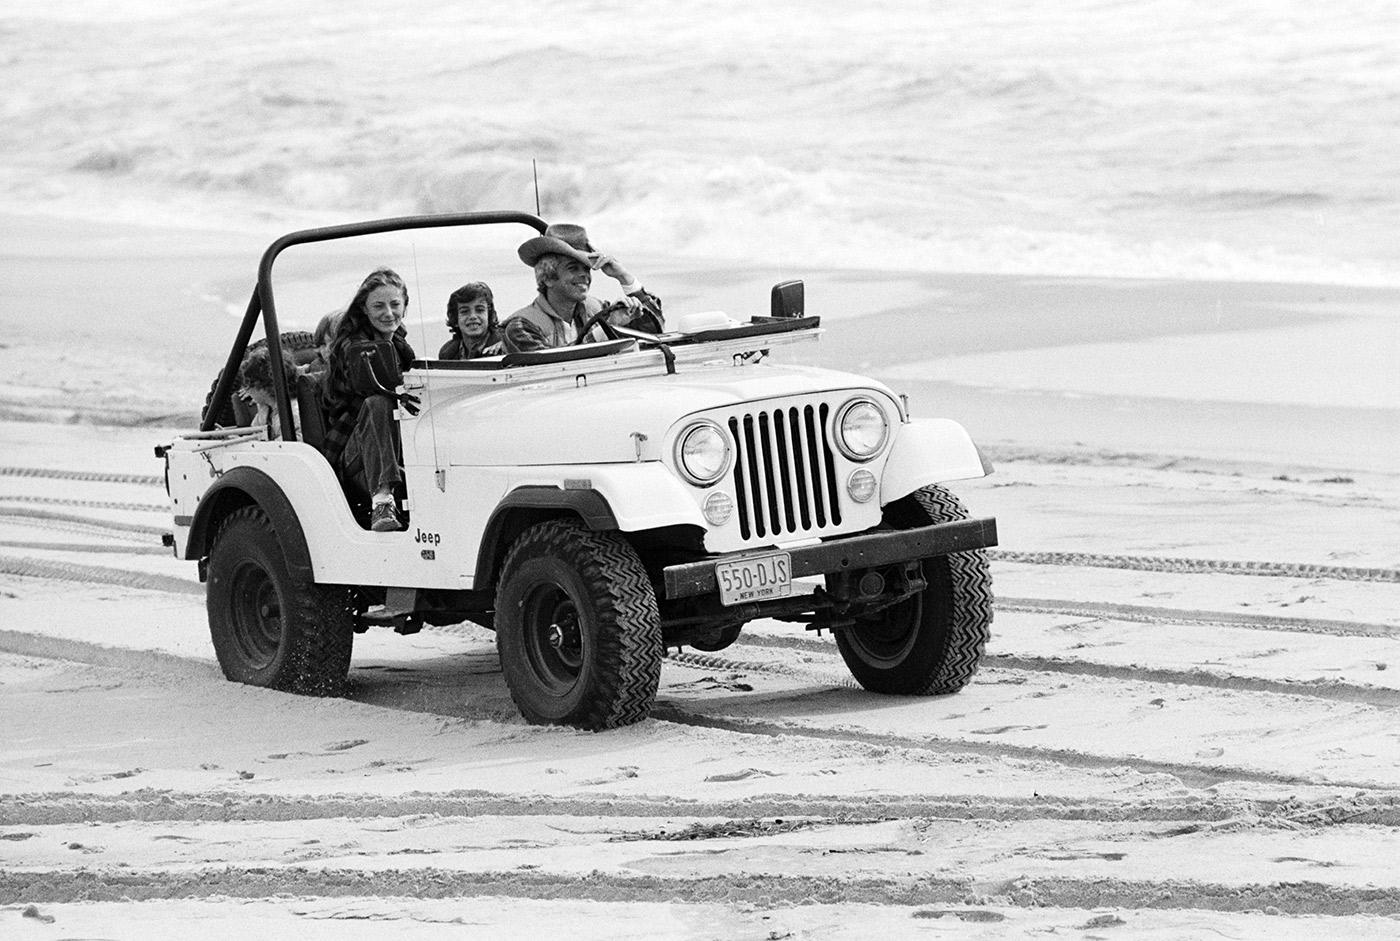 Plus Mag Rl Au Cool La Jeep Monde ID2H9WEY